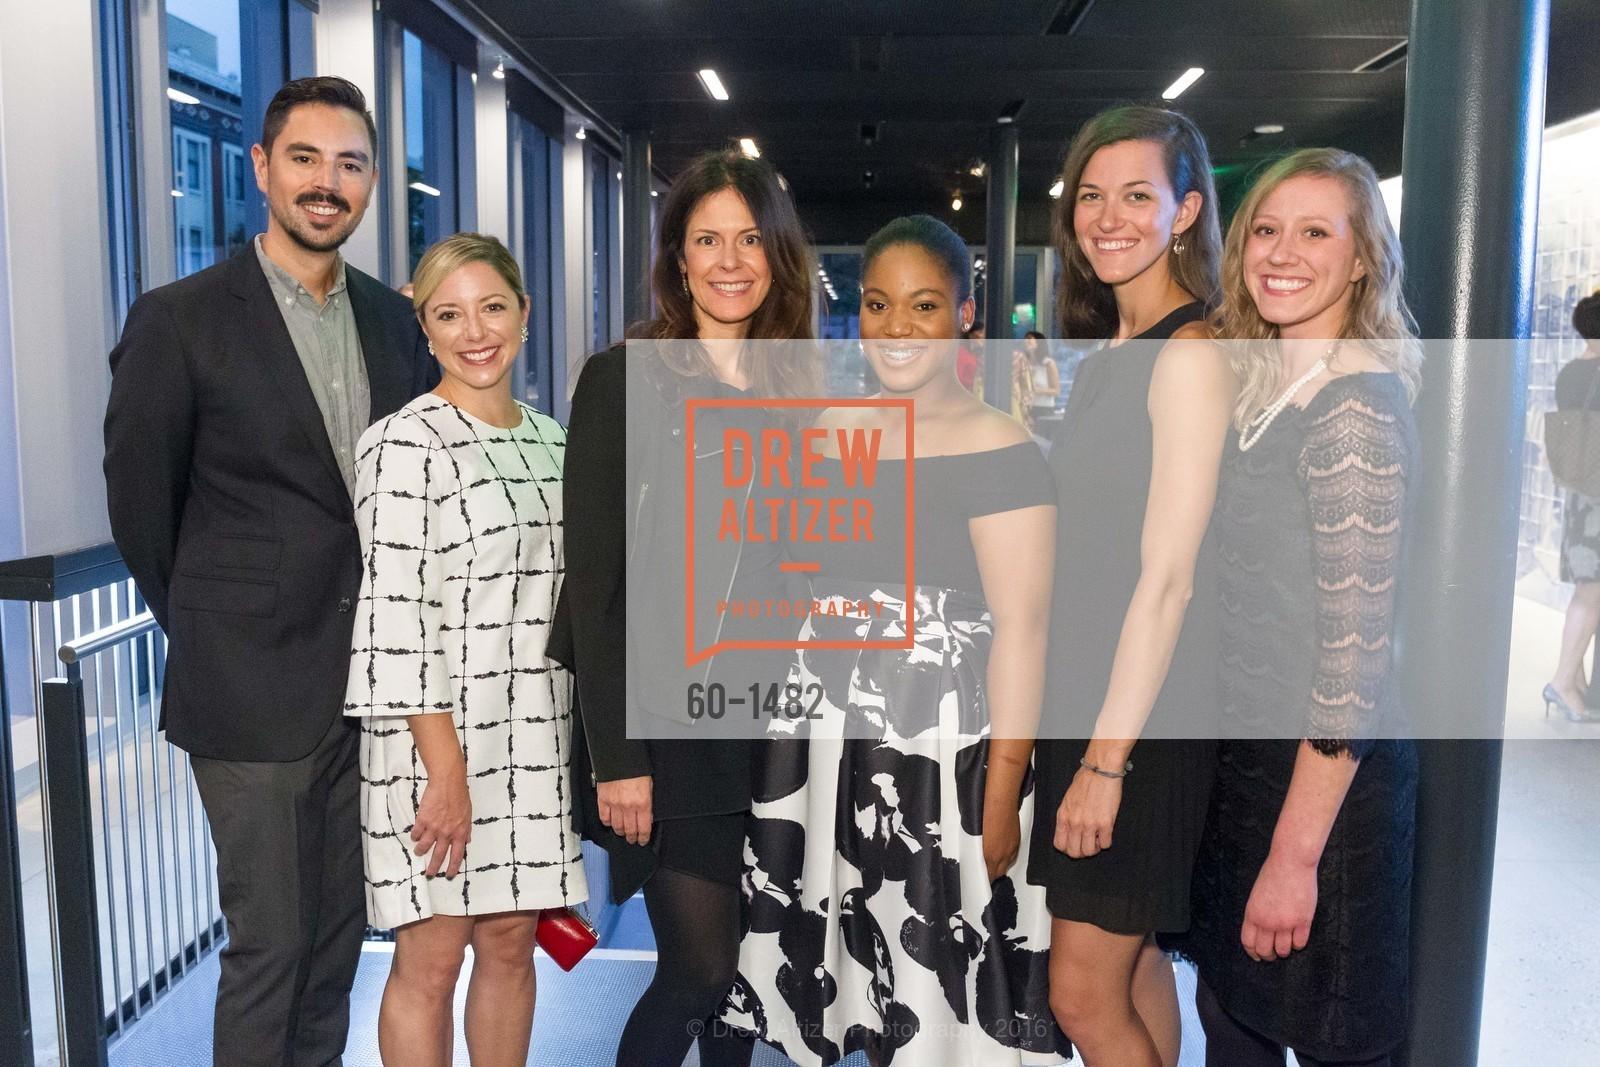 Peter Felix, Marissa Dogherty, Jeanette Astorga, Lauren Seroyer, Anna Paulus, Allison Lepiarz, Photo #60-1482